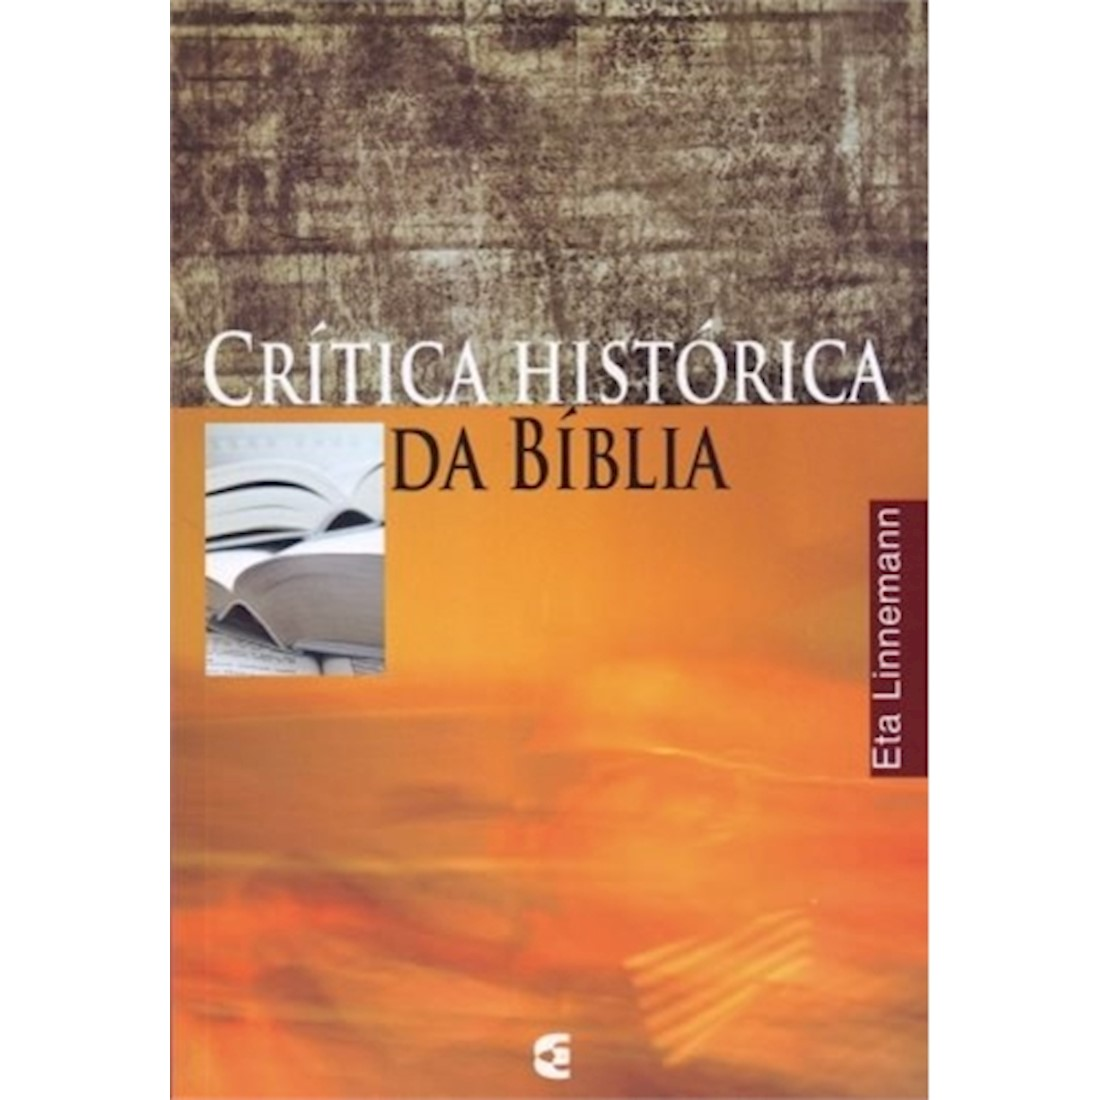 Livro Crítica Histórica da Bíblia